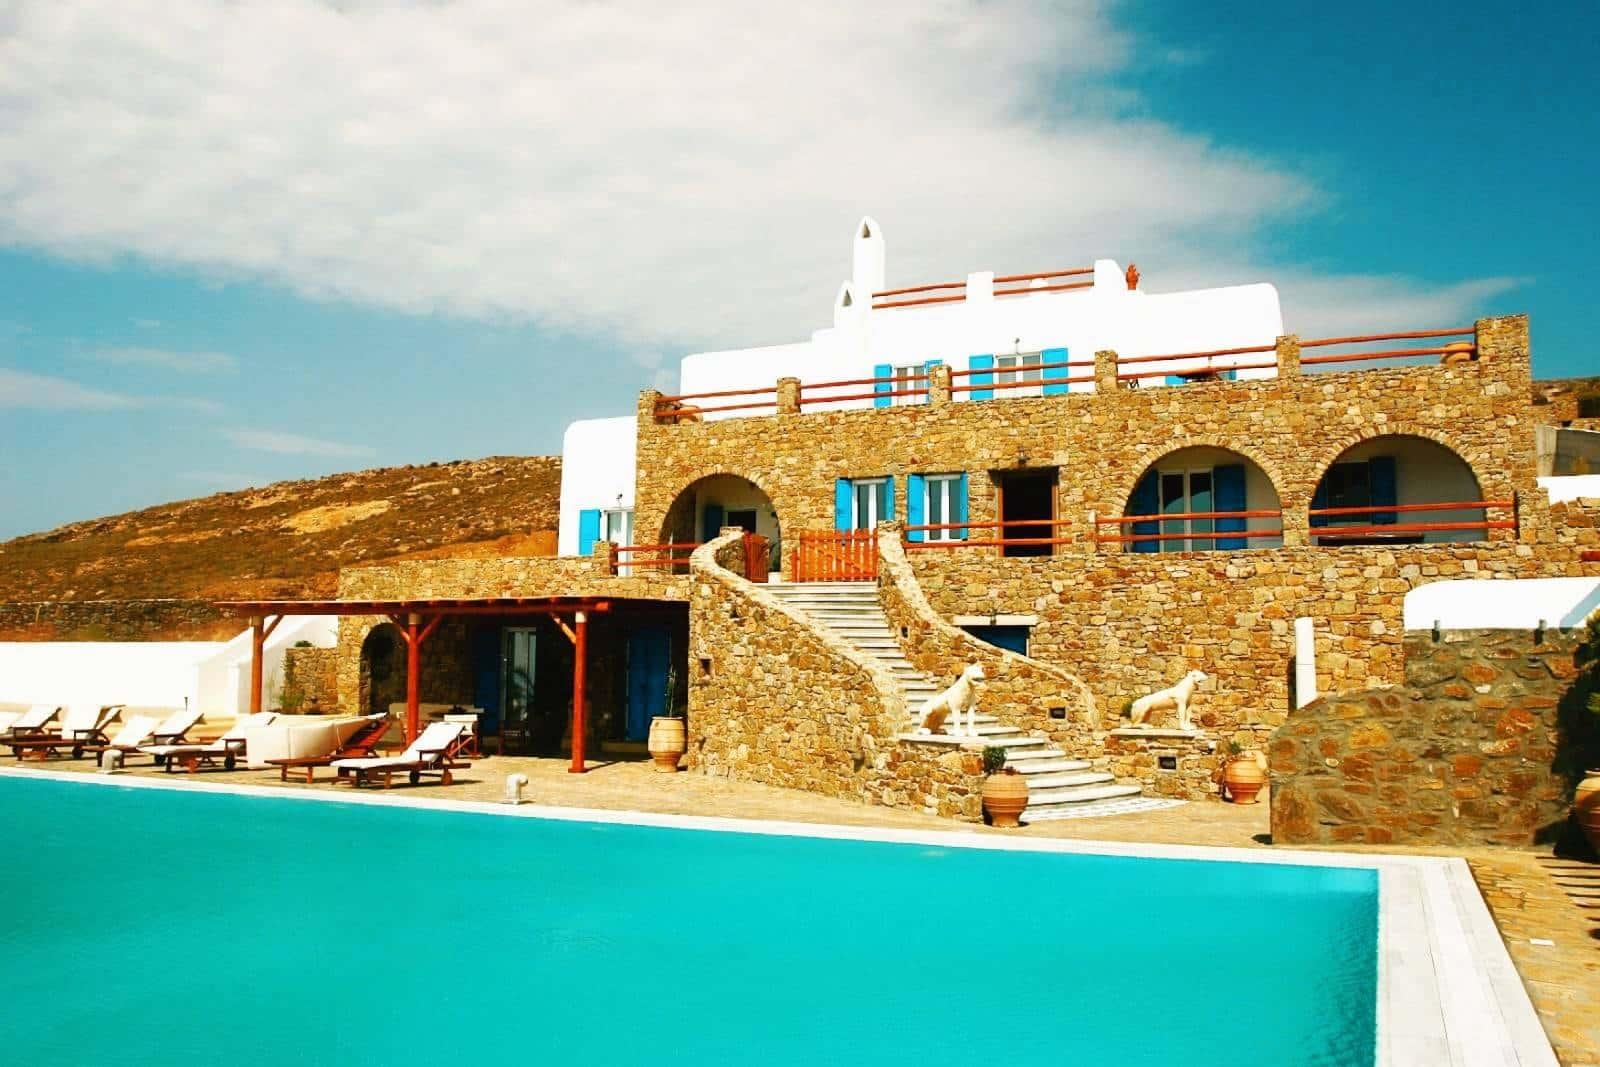 luxurious villa Mykonos - πολυτελής βίλα Μύκονος - mykonos services - οικοδομικές εργασίες 25